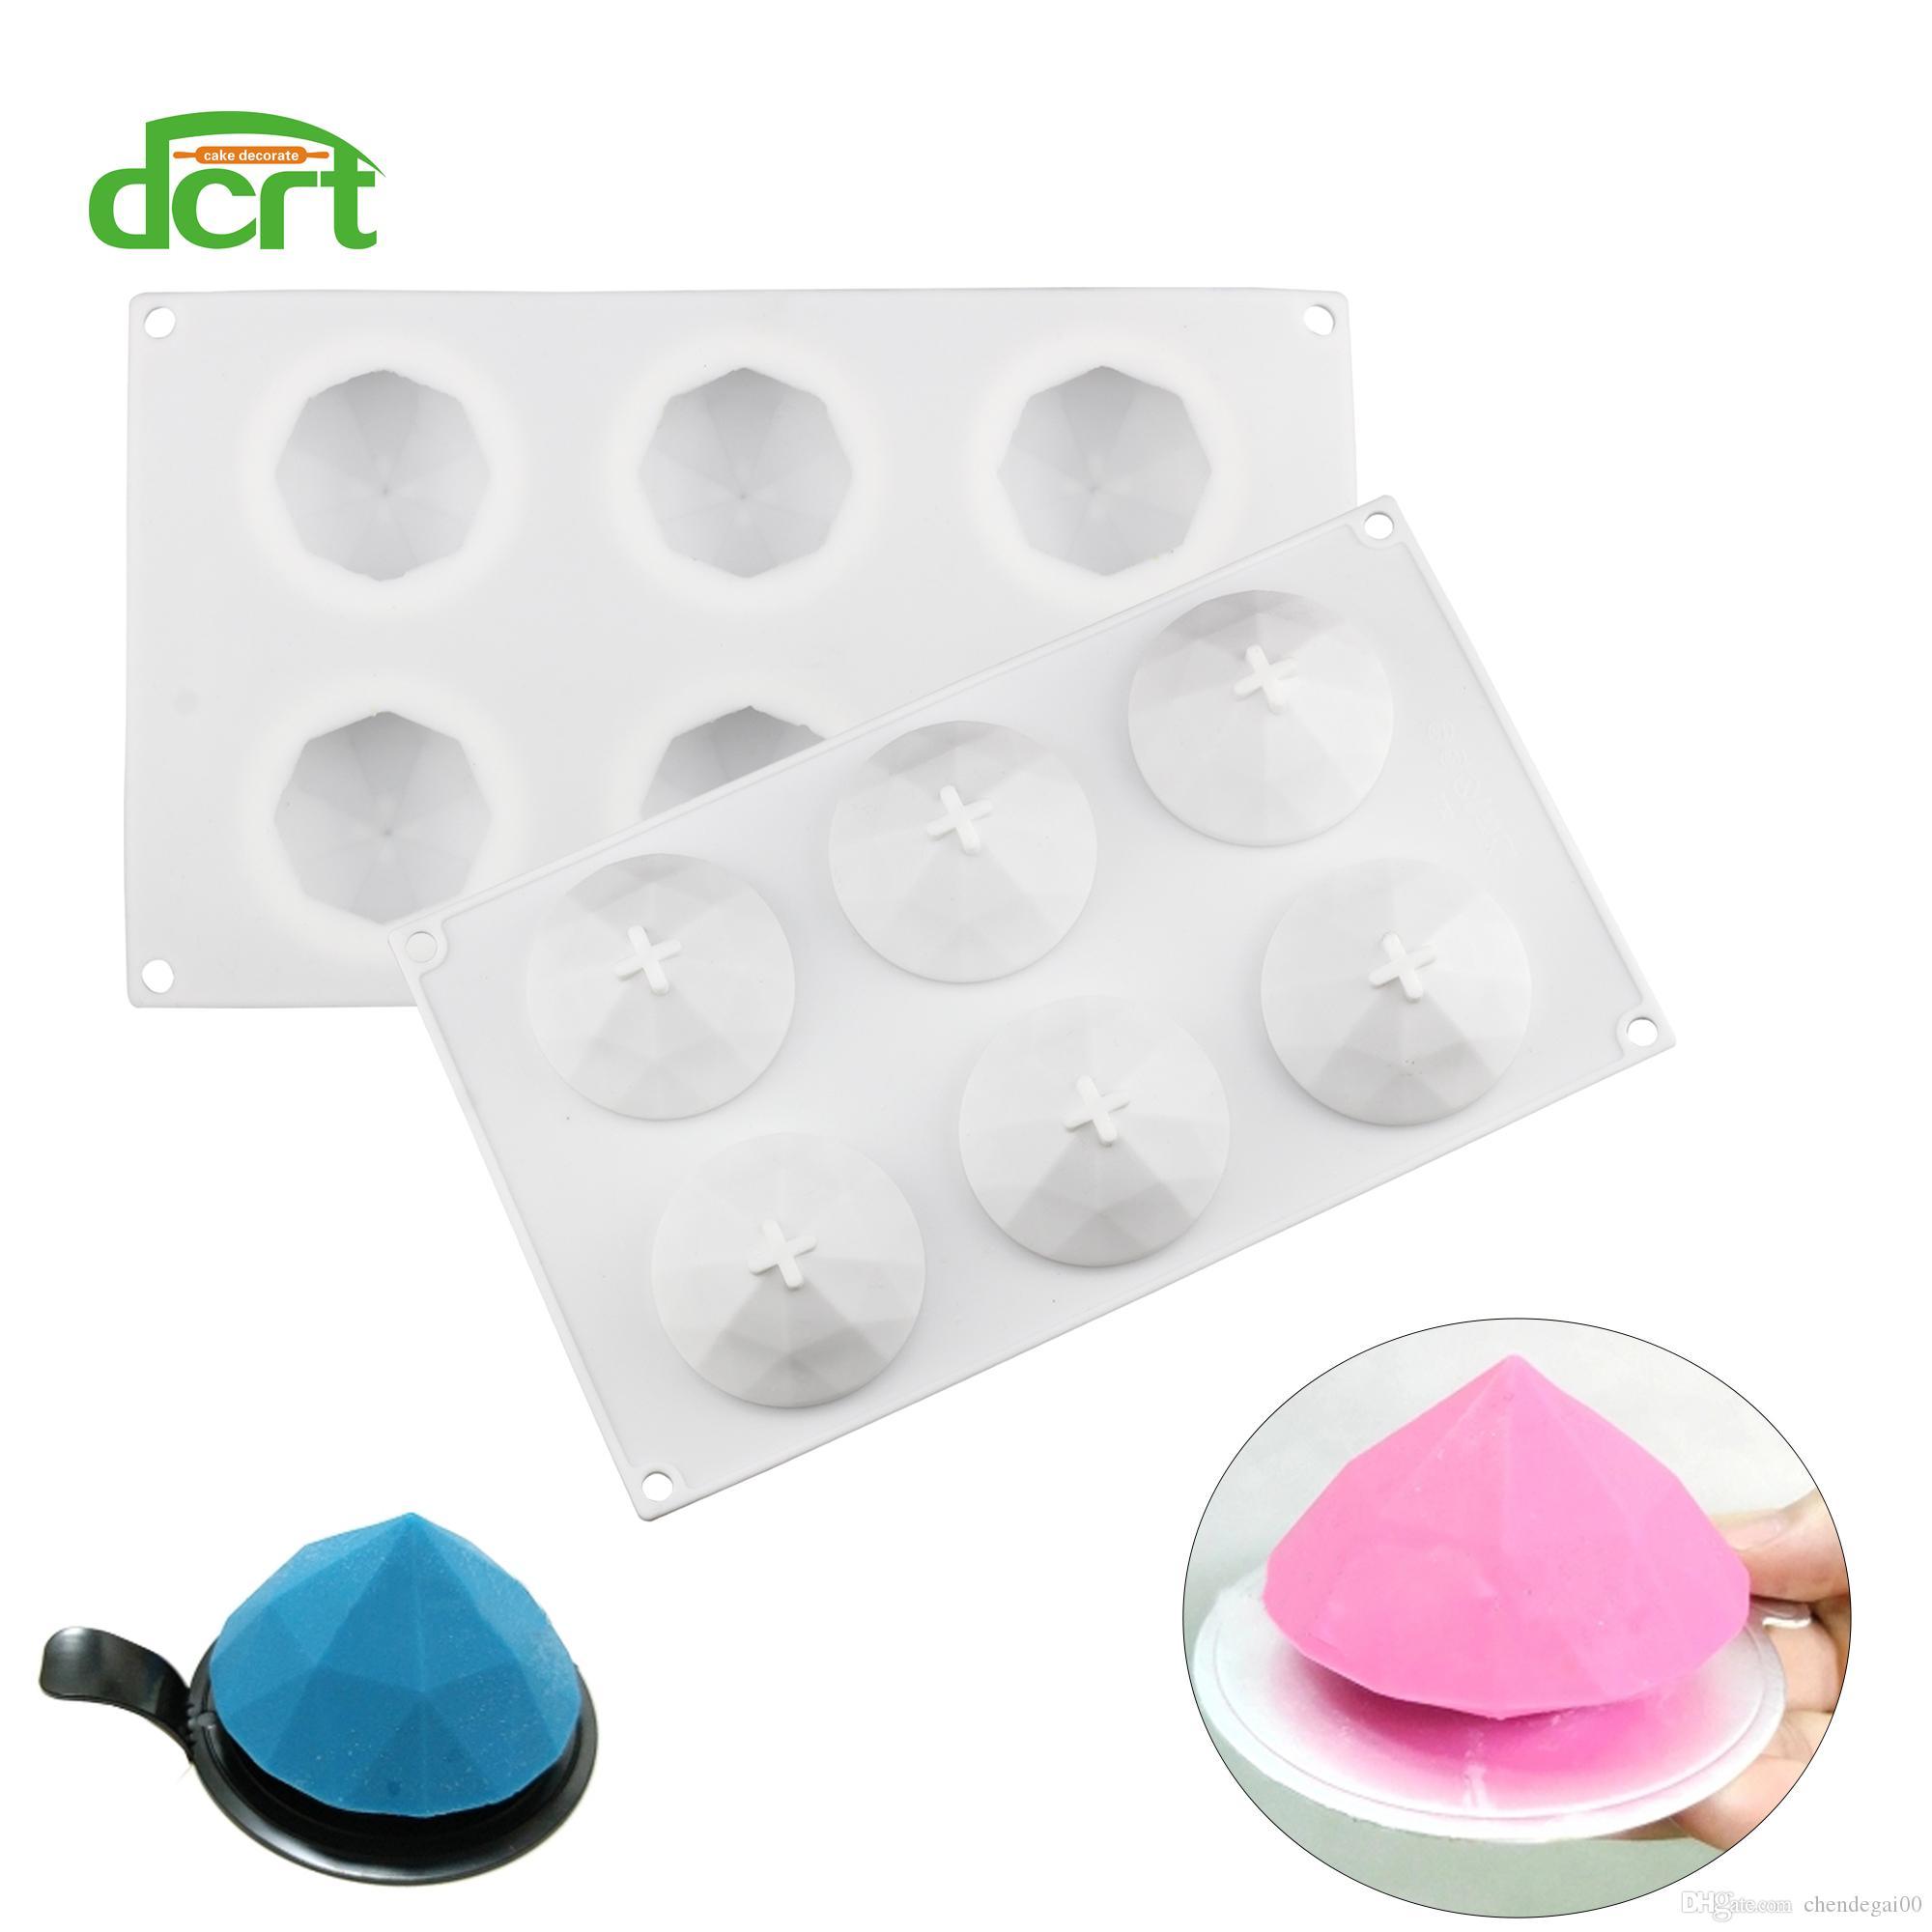 DCRT Baking Mould 3D Diamond Shaped Silicone Cake Mold Chocolate Pudding Ice Fondant Tools Cake Decorating Tools